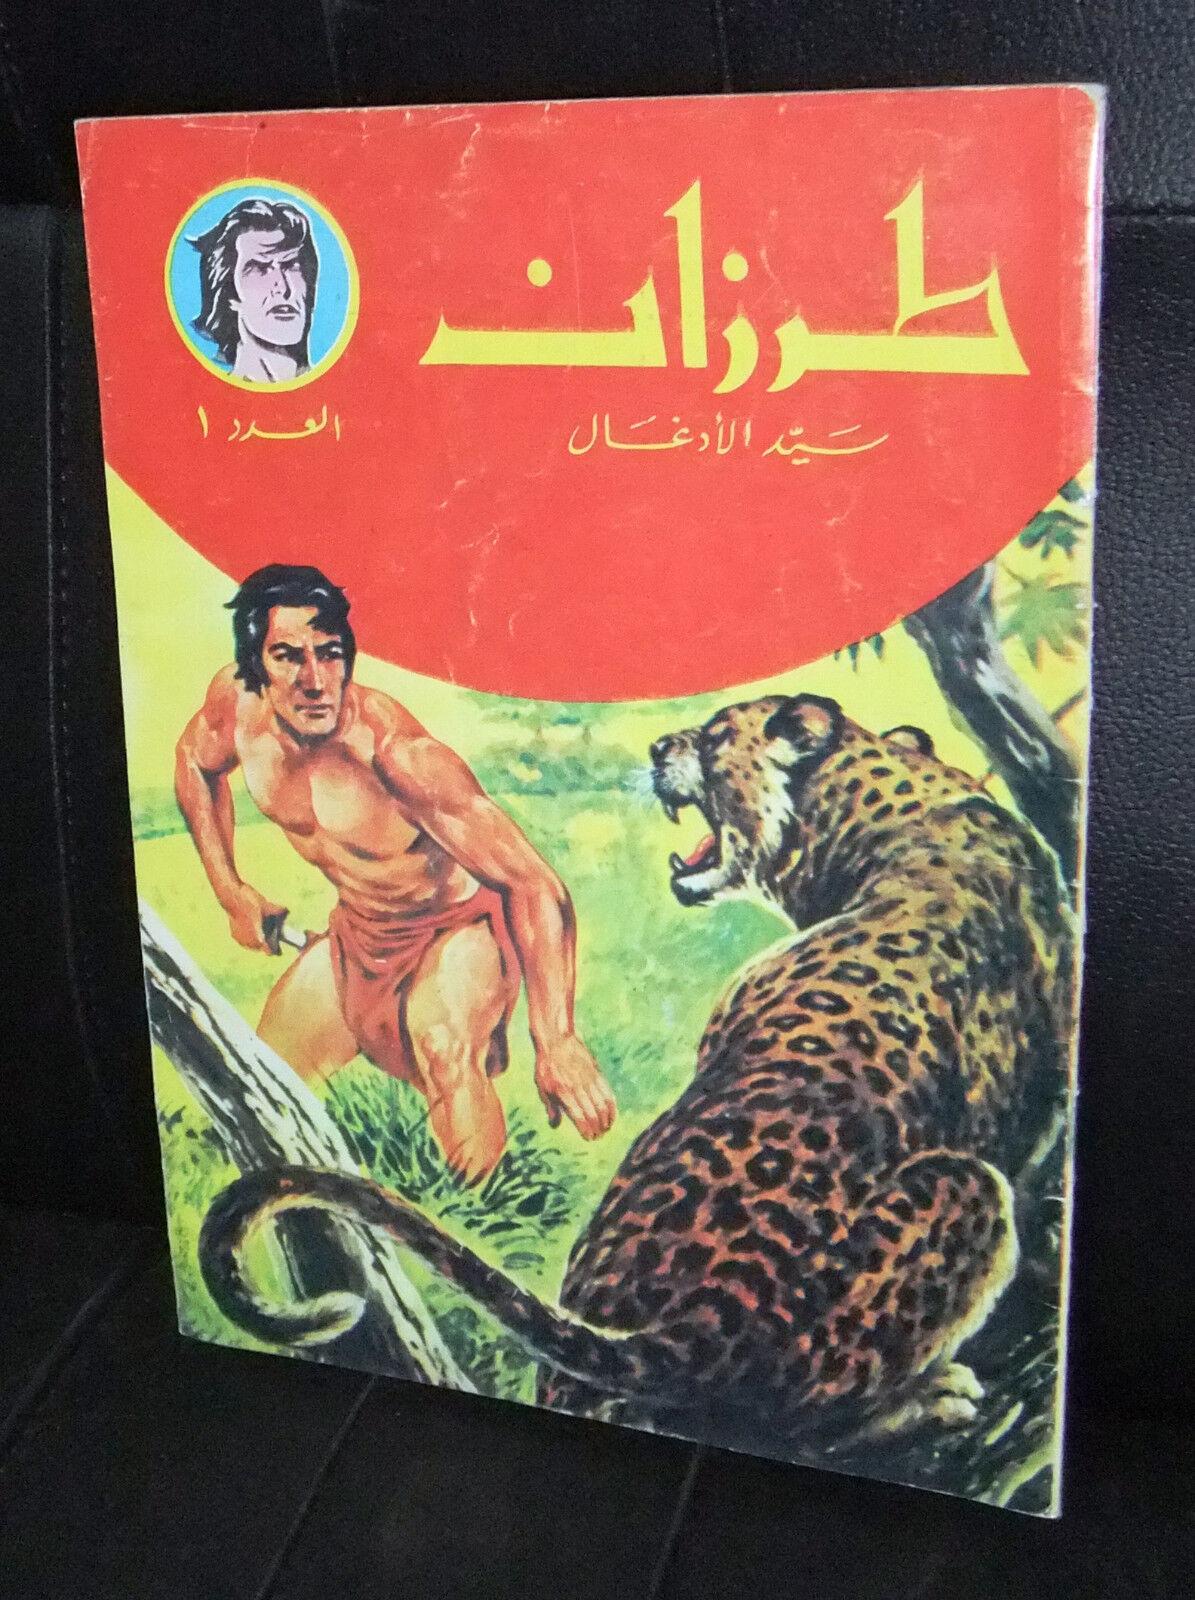 Tarzán طرزان كومكس libanés original original original en árabe Raro Comics 1980s  estilo clásico